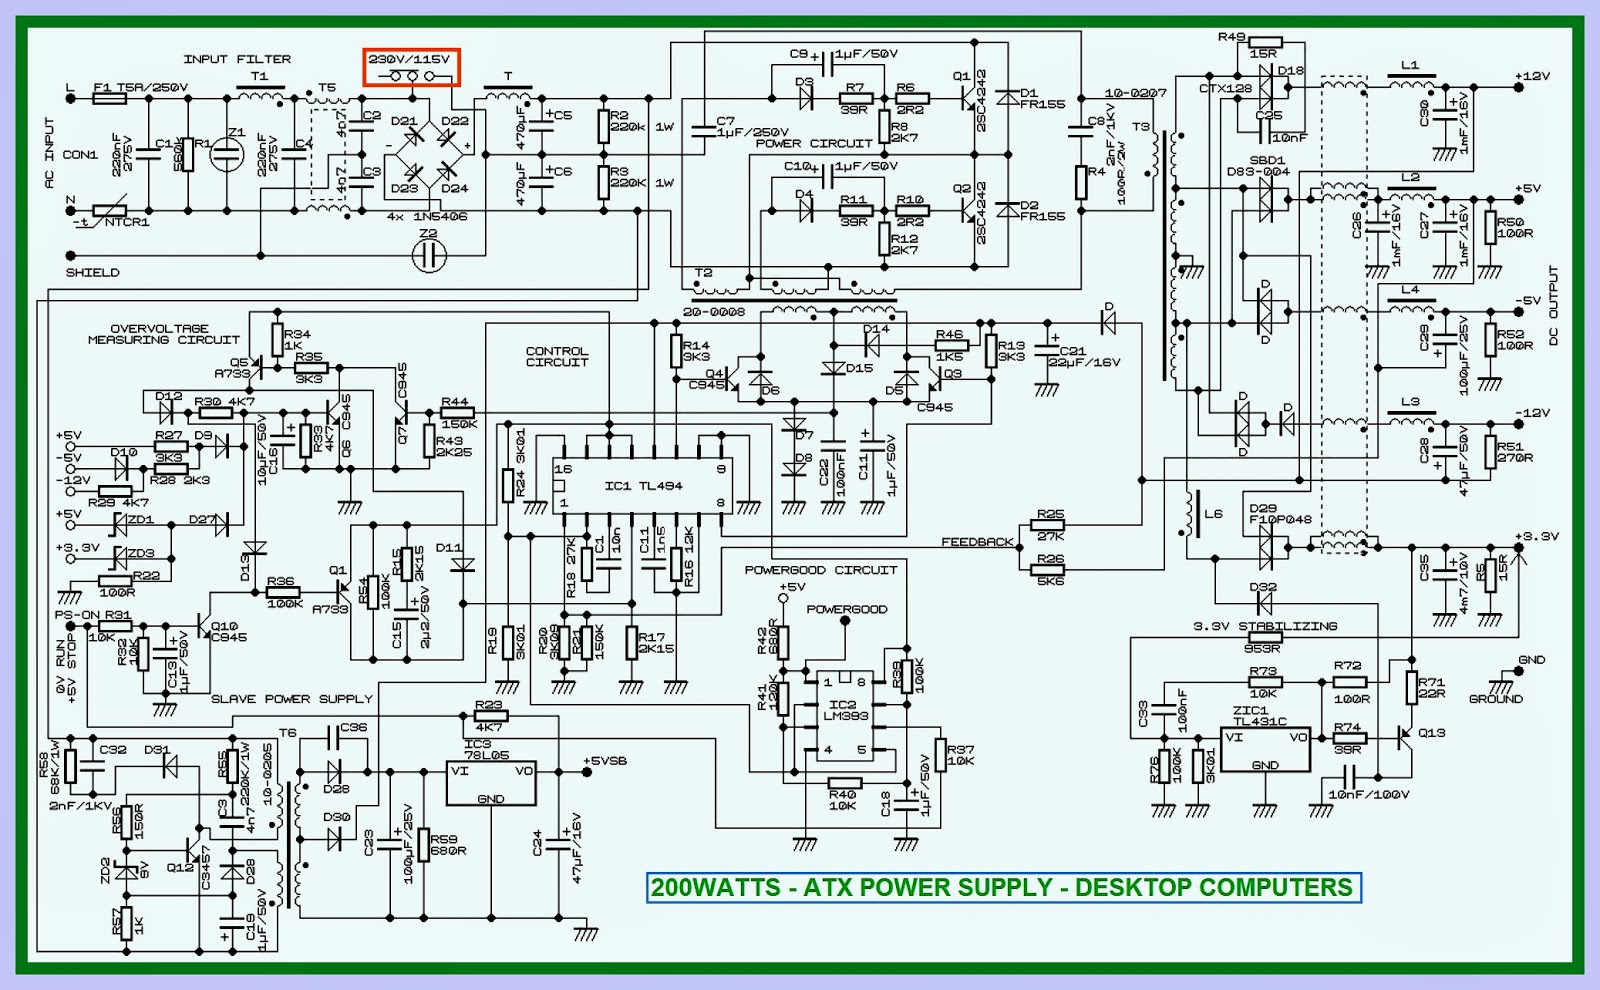 Desktop Computer Power Supply